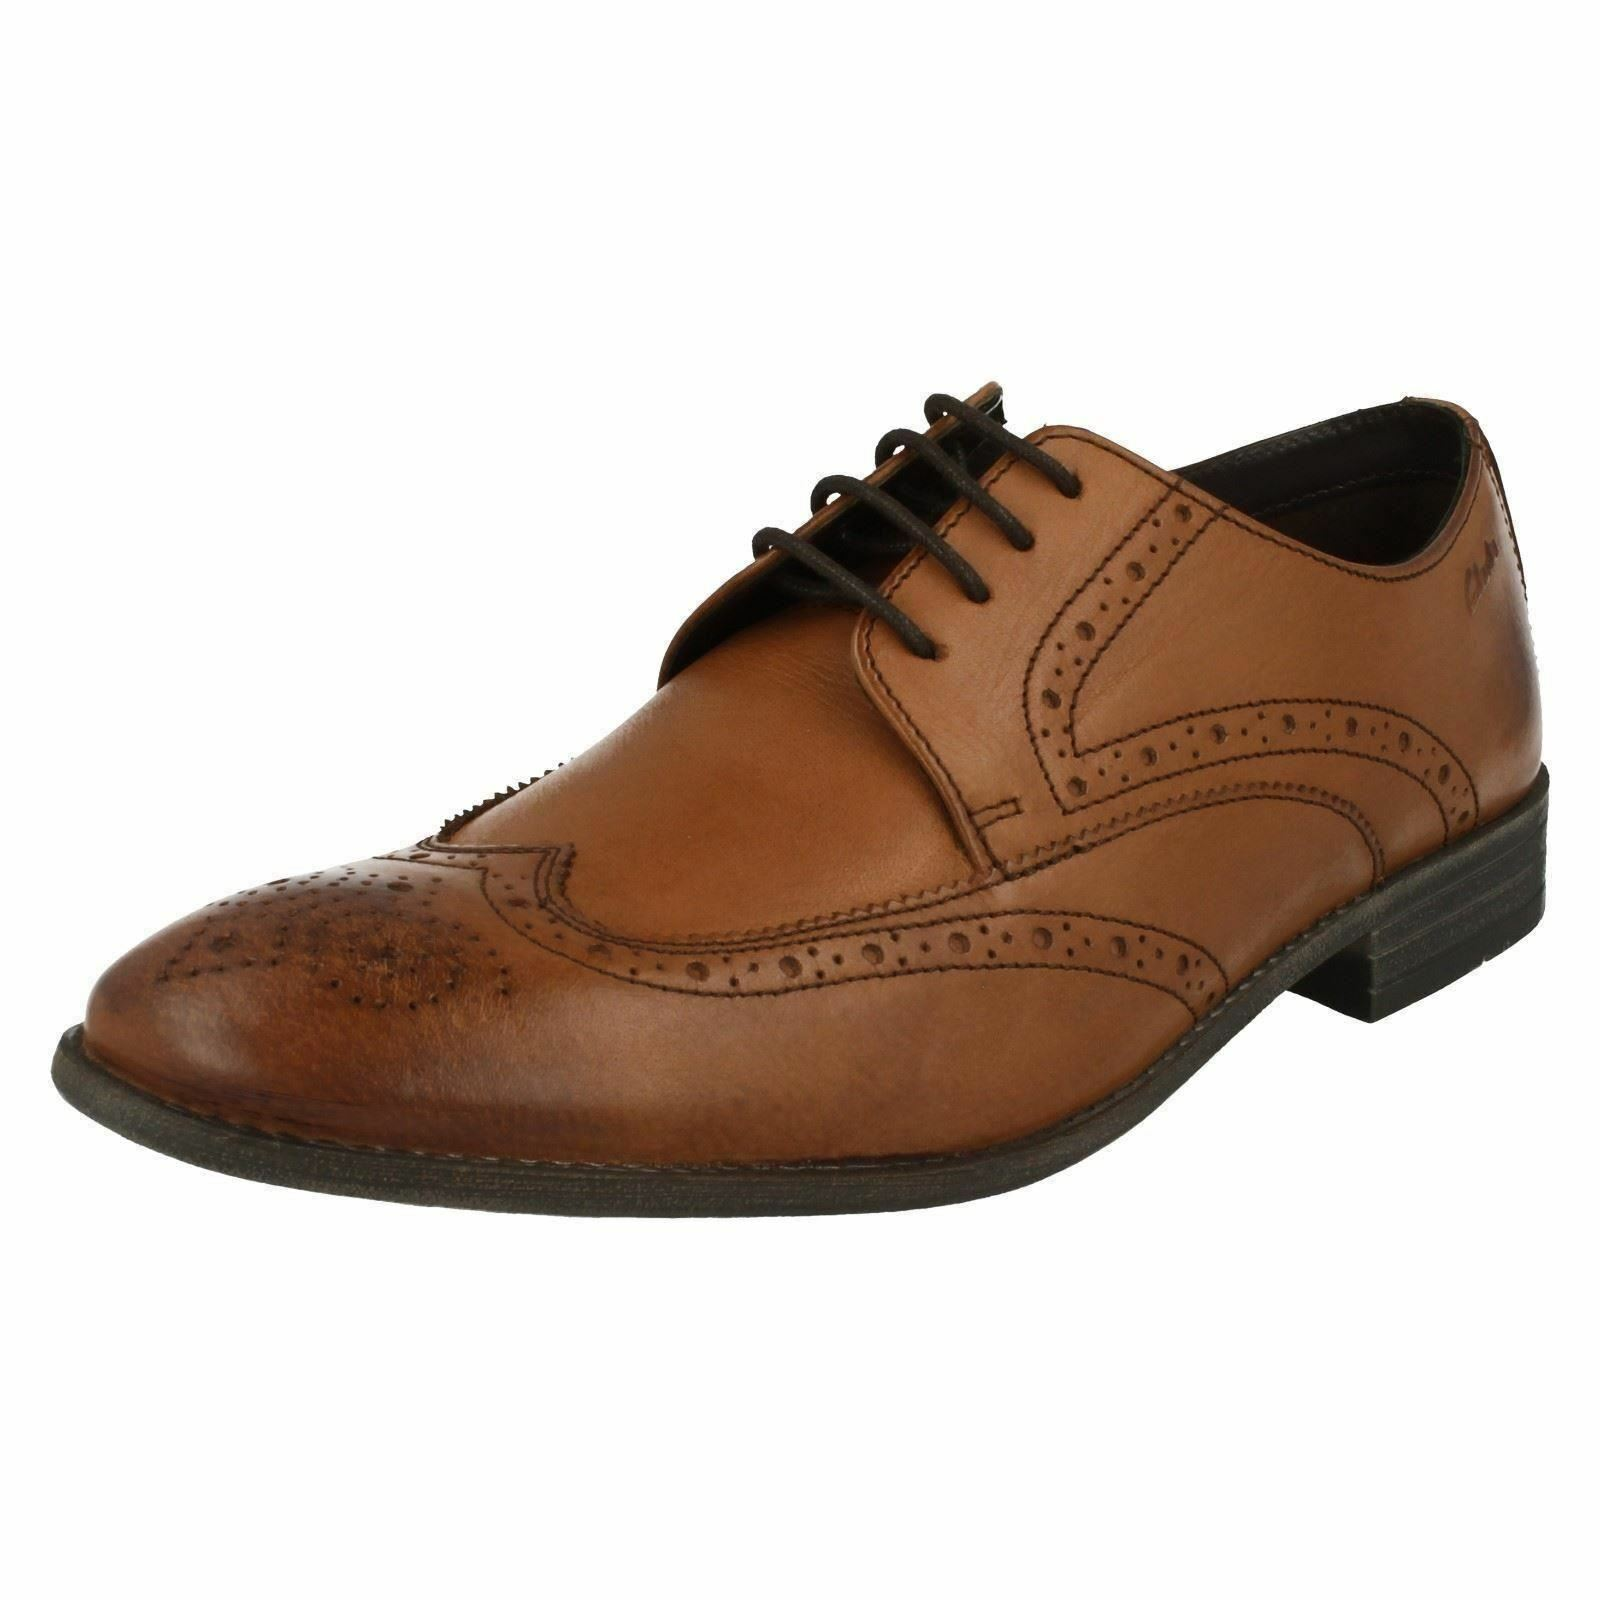 Leder Herren Clarks Chart Limit Leder  Smart Lace Up Brogue Schuhes G Fitting 7c9154